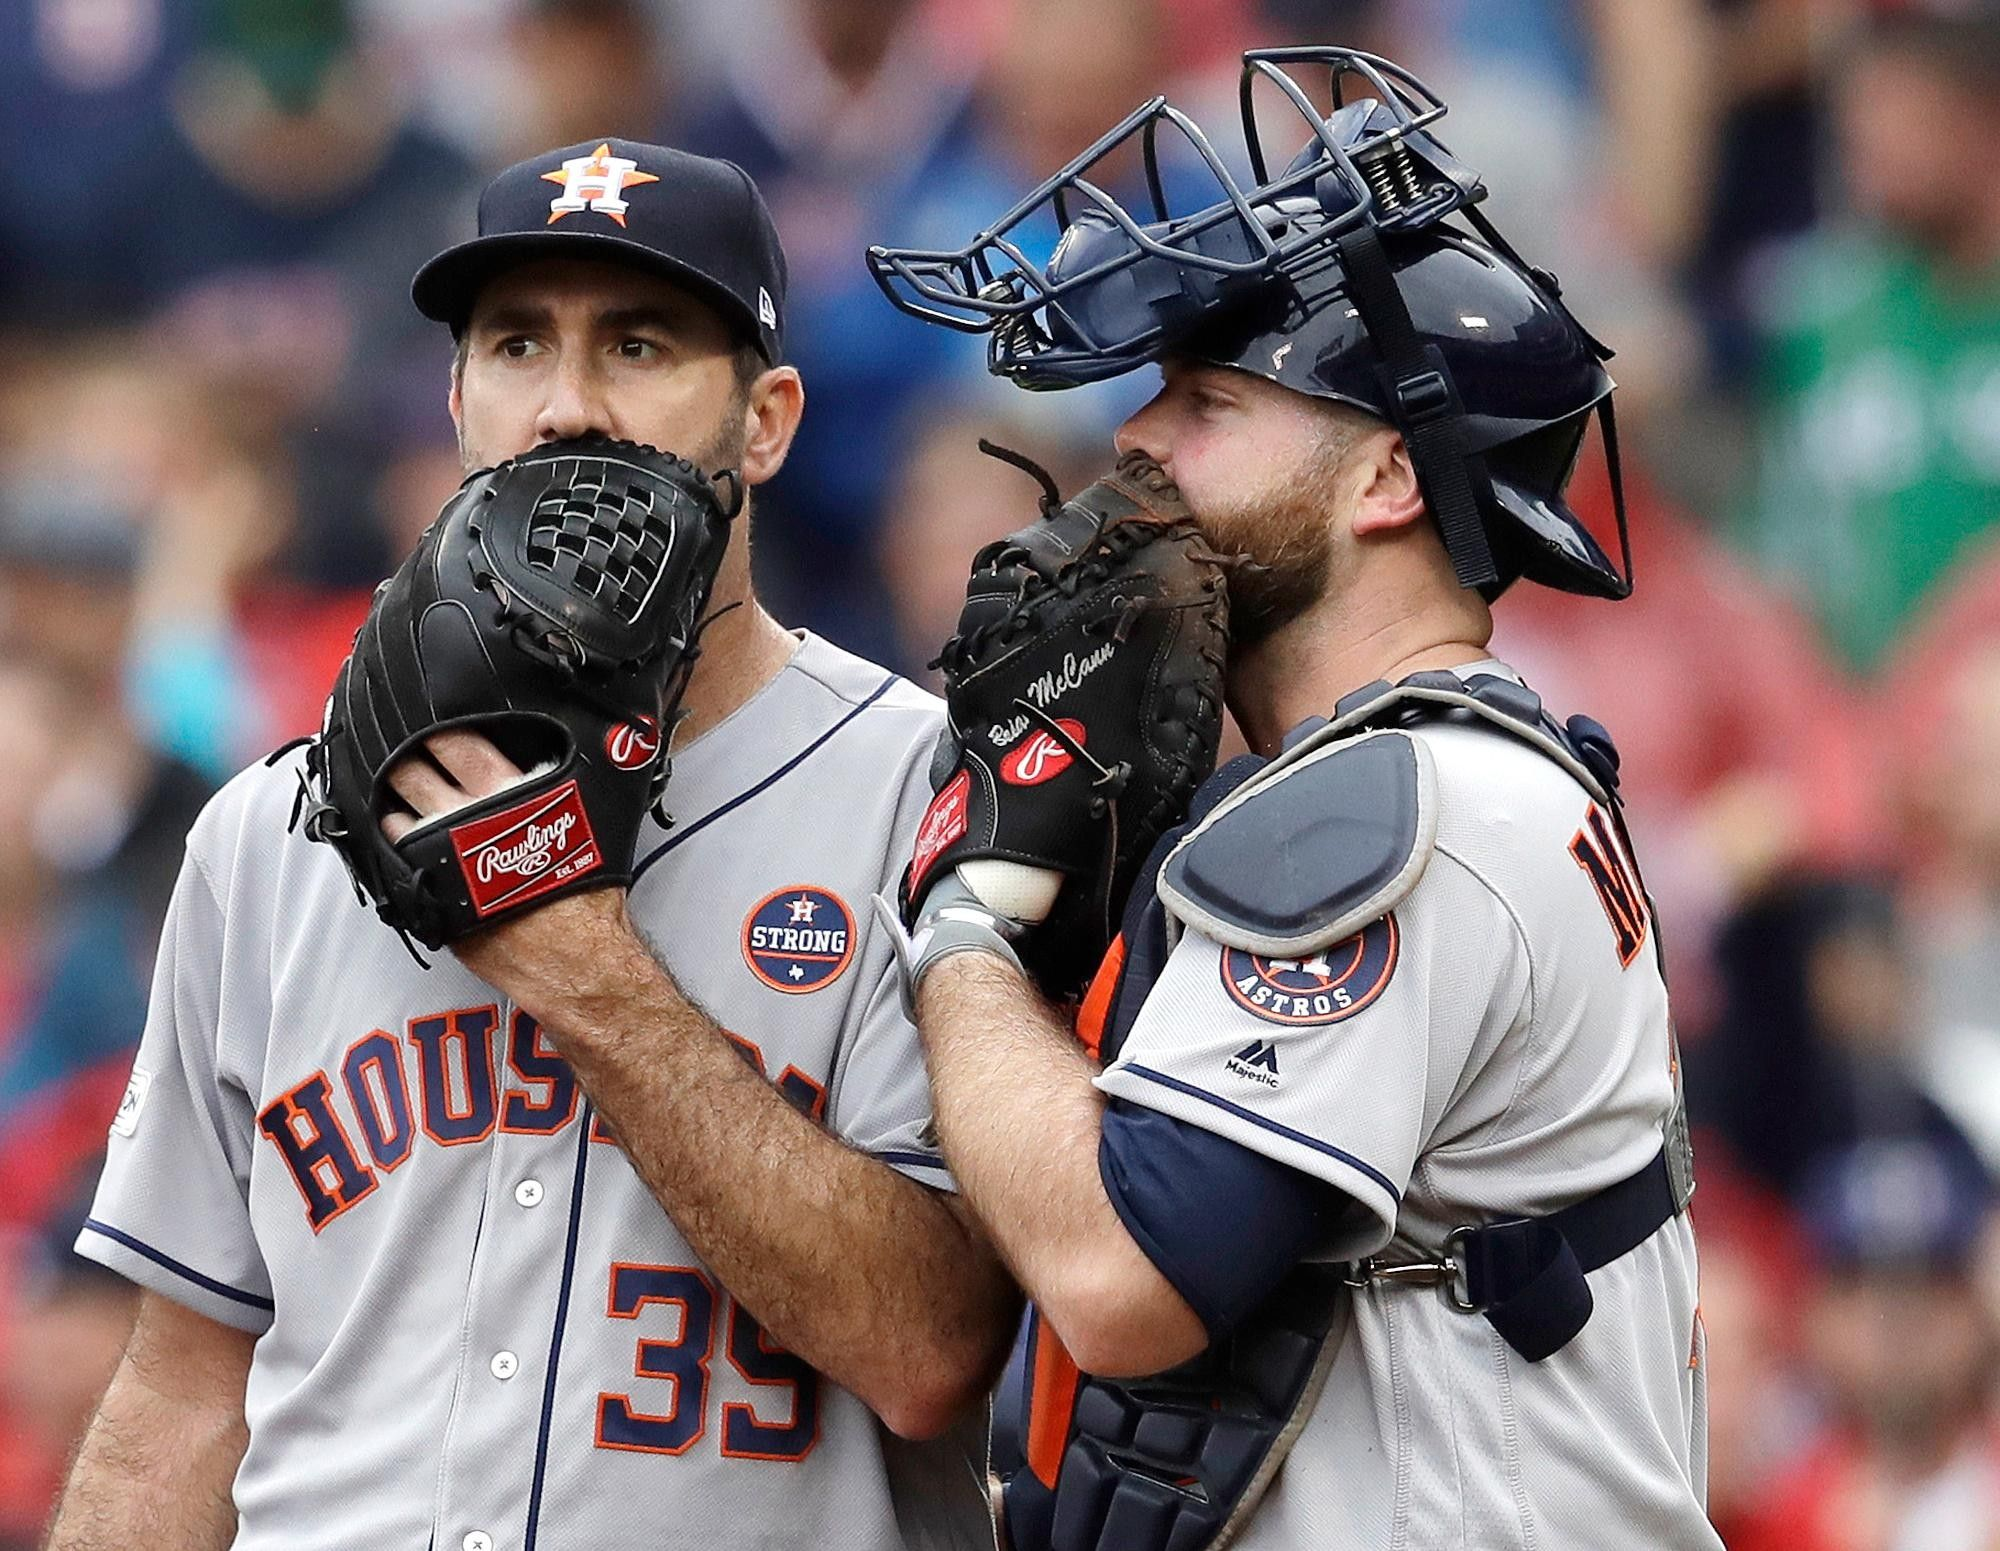 Houston Astros relief pitcher Justin Verlander, left, and